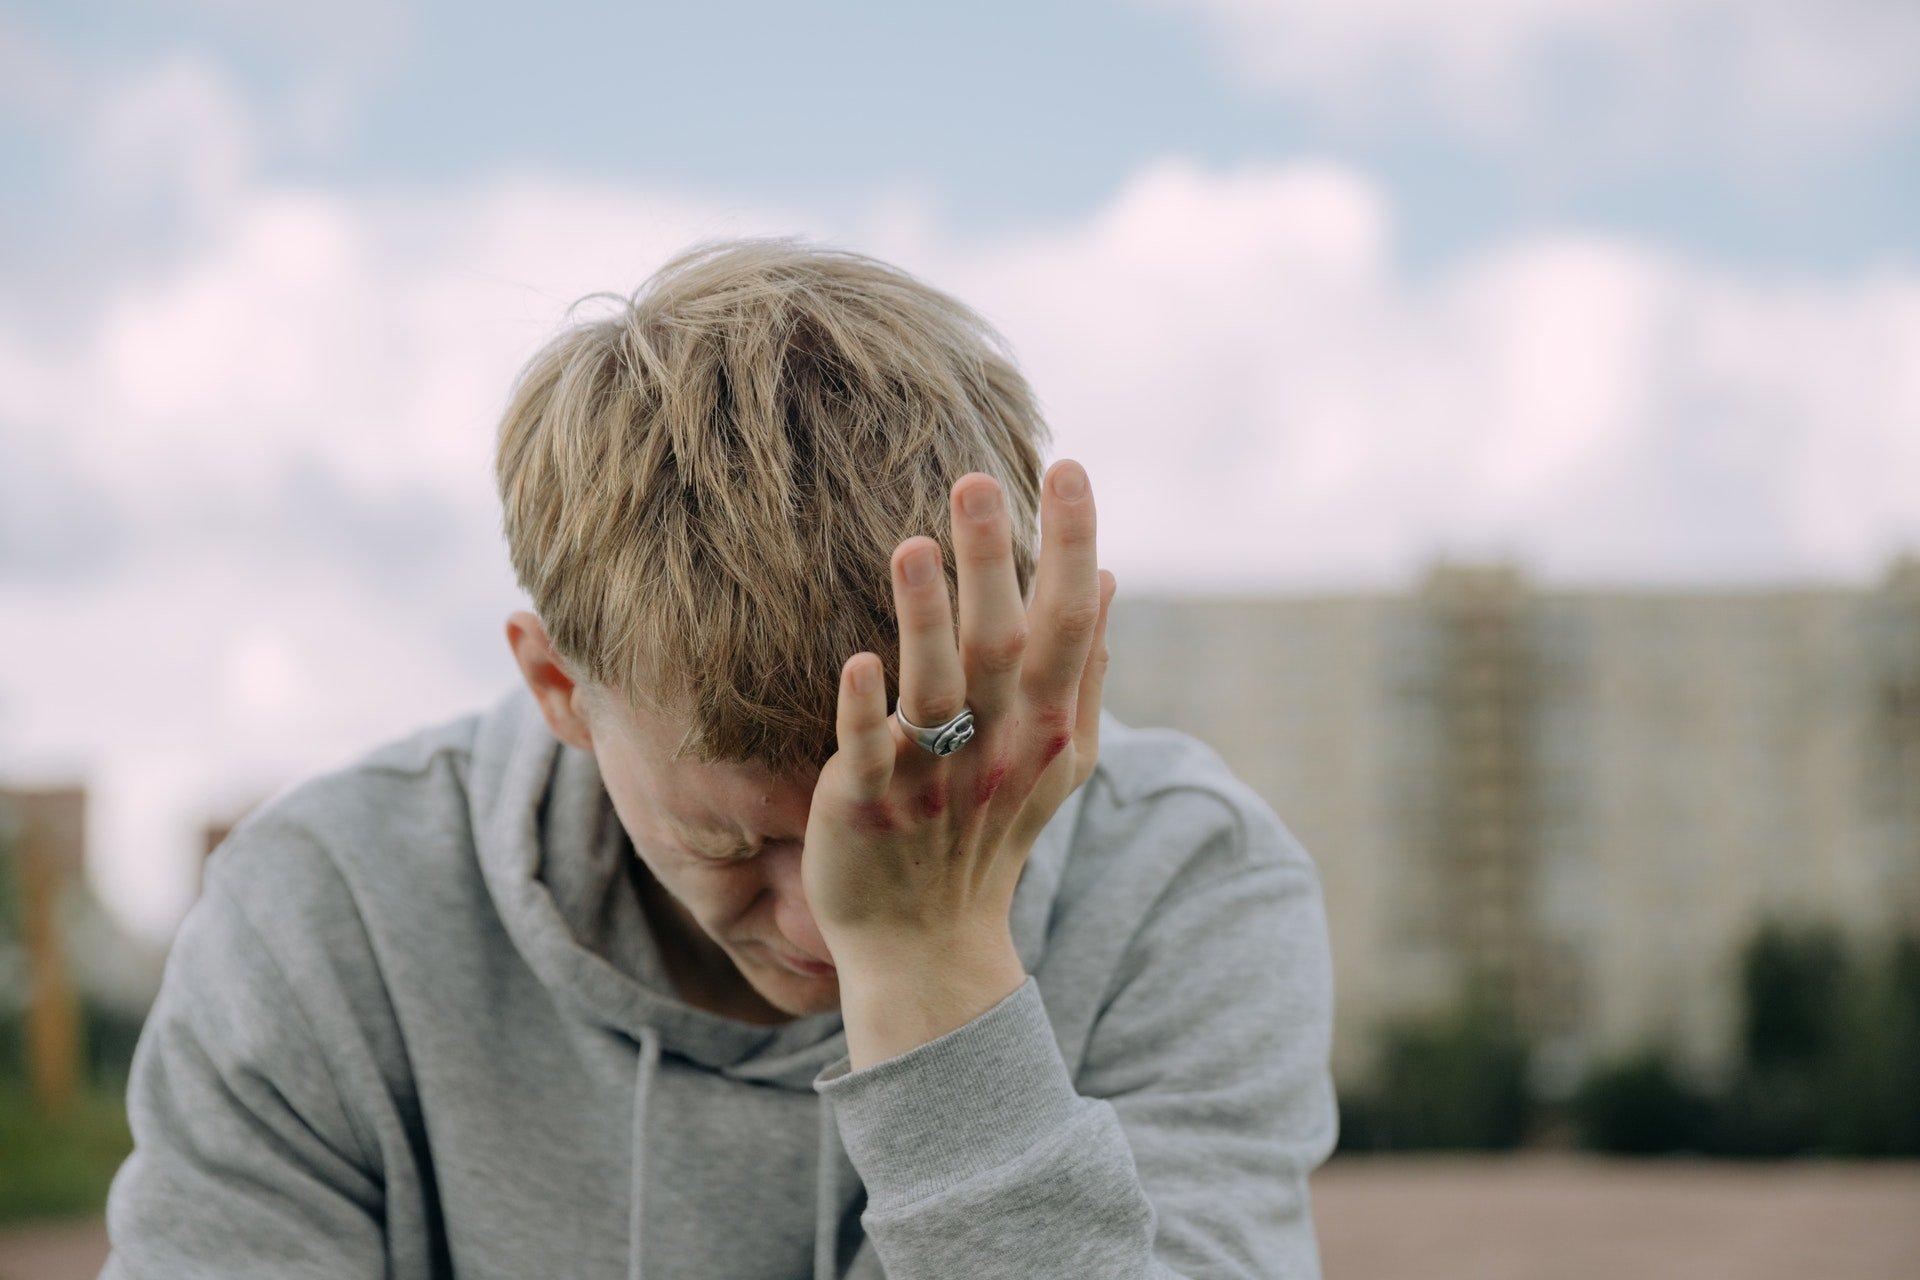 boy crying rubbing his eyes